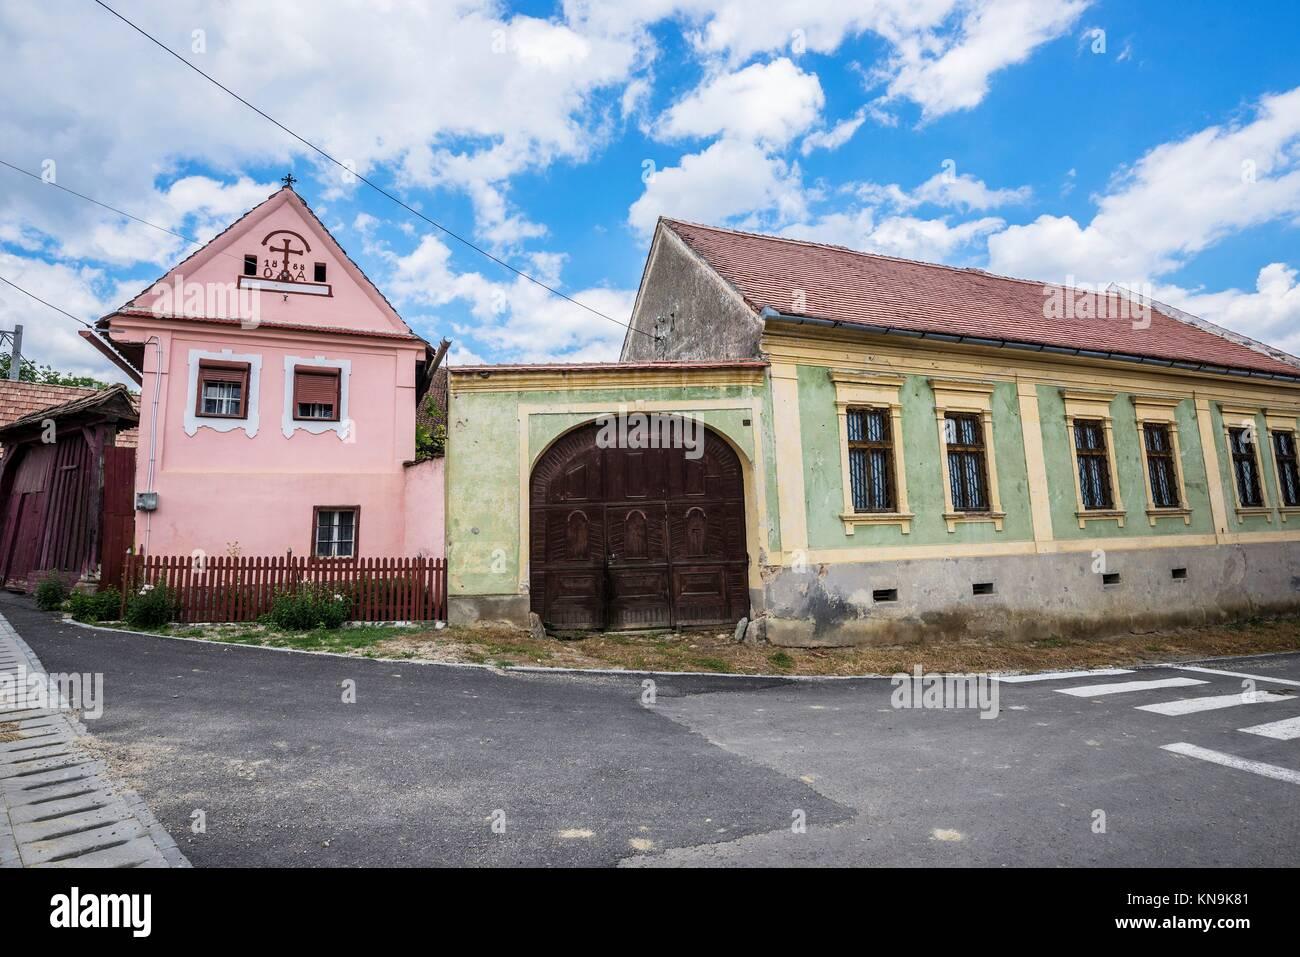 Old wooden rustic house romania stock photos old wooden rustic house romania stock images alamy - Saxon style houses in transylvania ...